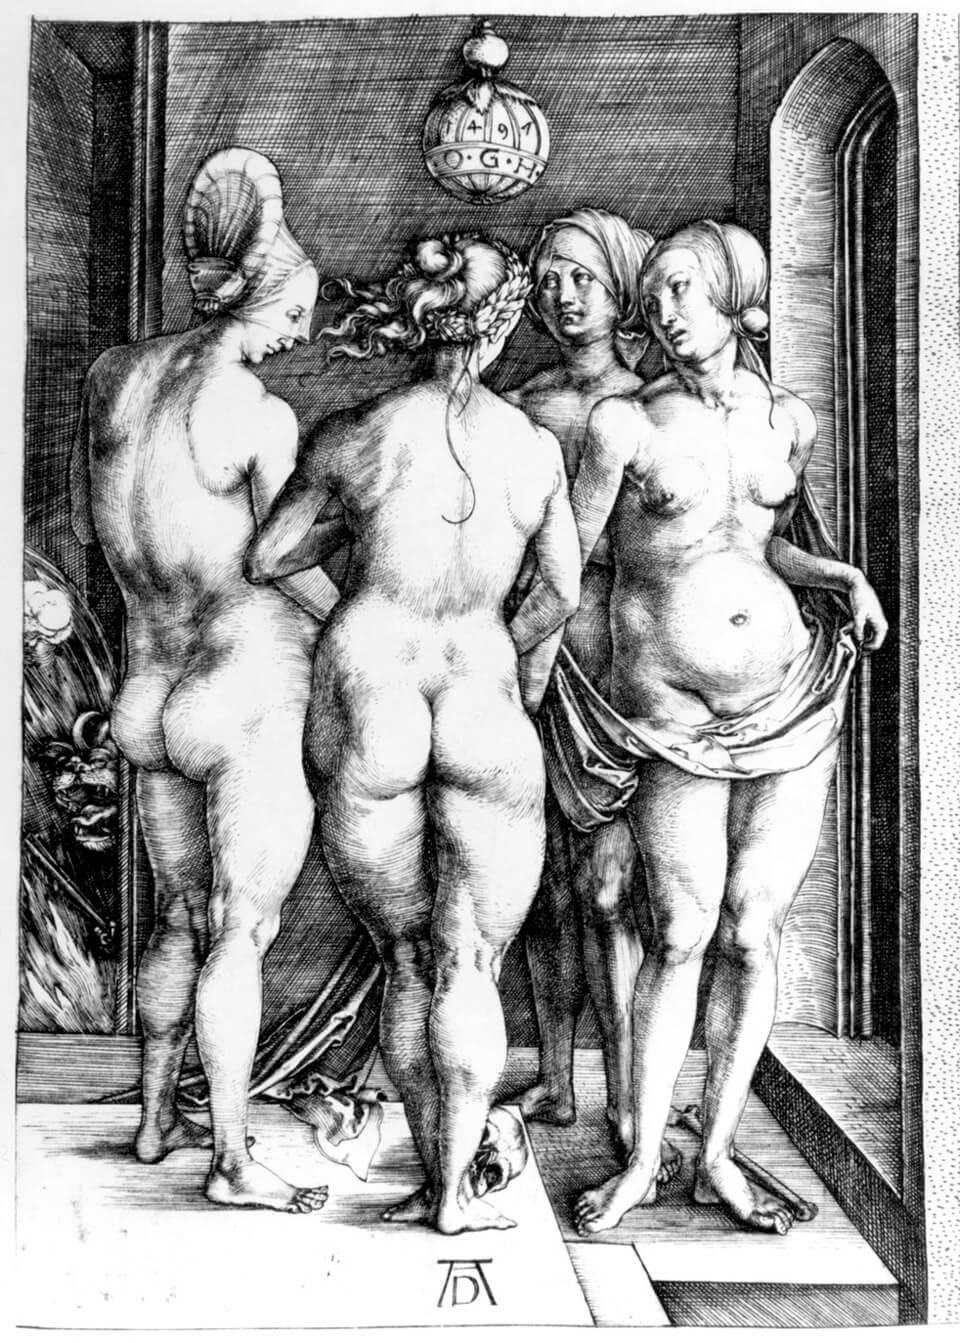 Apócrifa Art Magazine, Brujas, Cuatro brujas